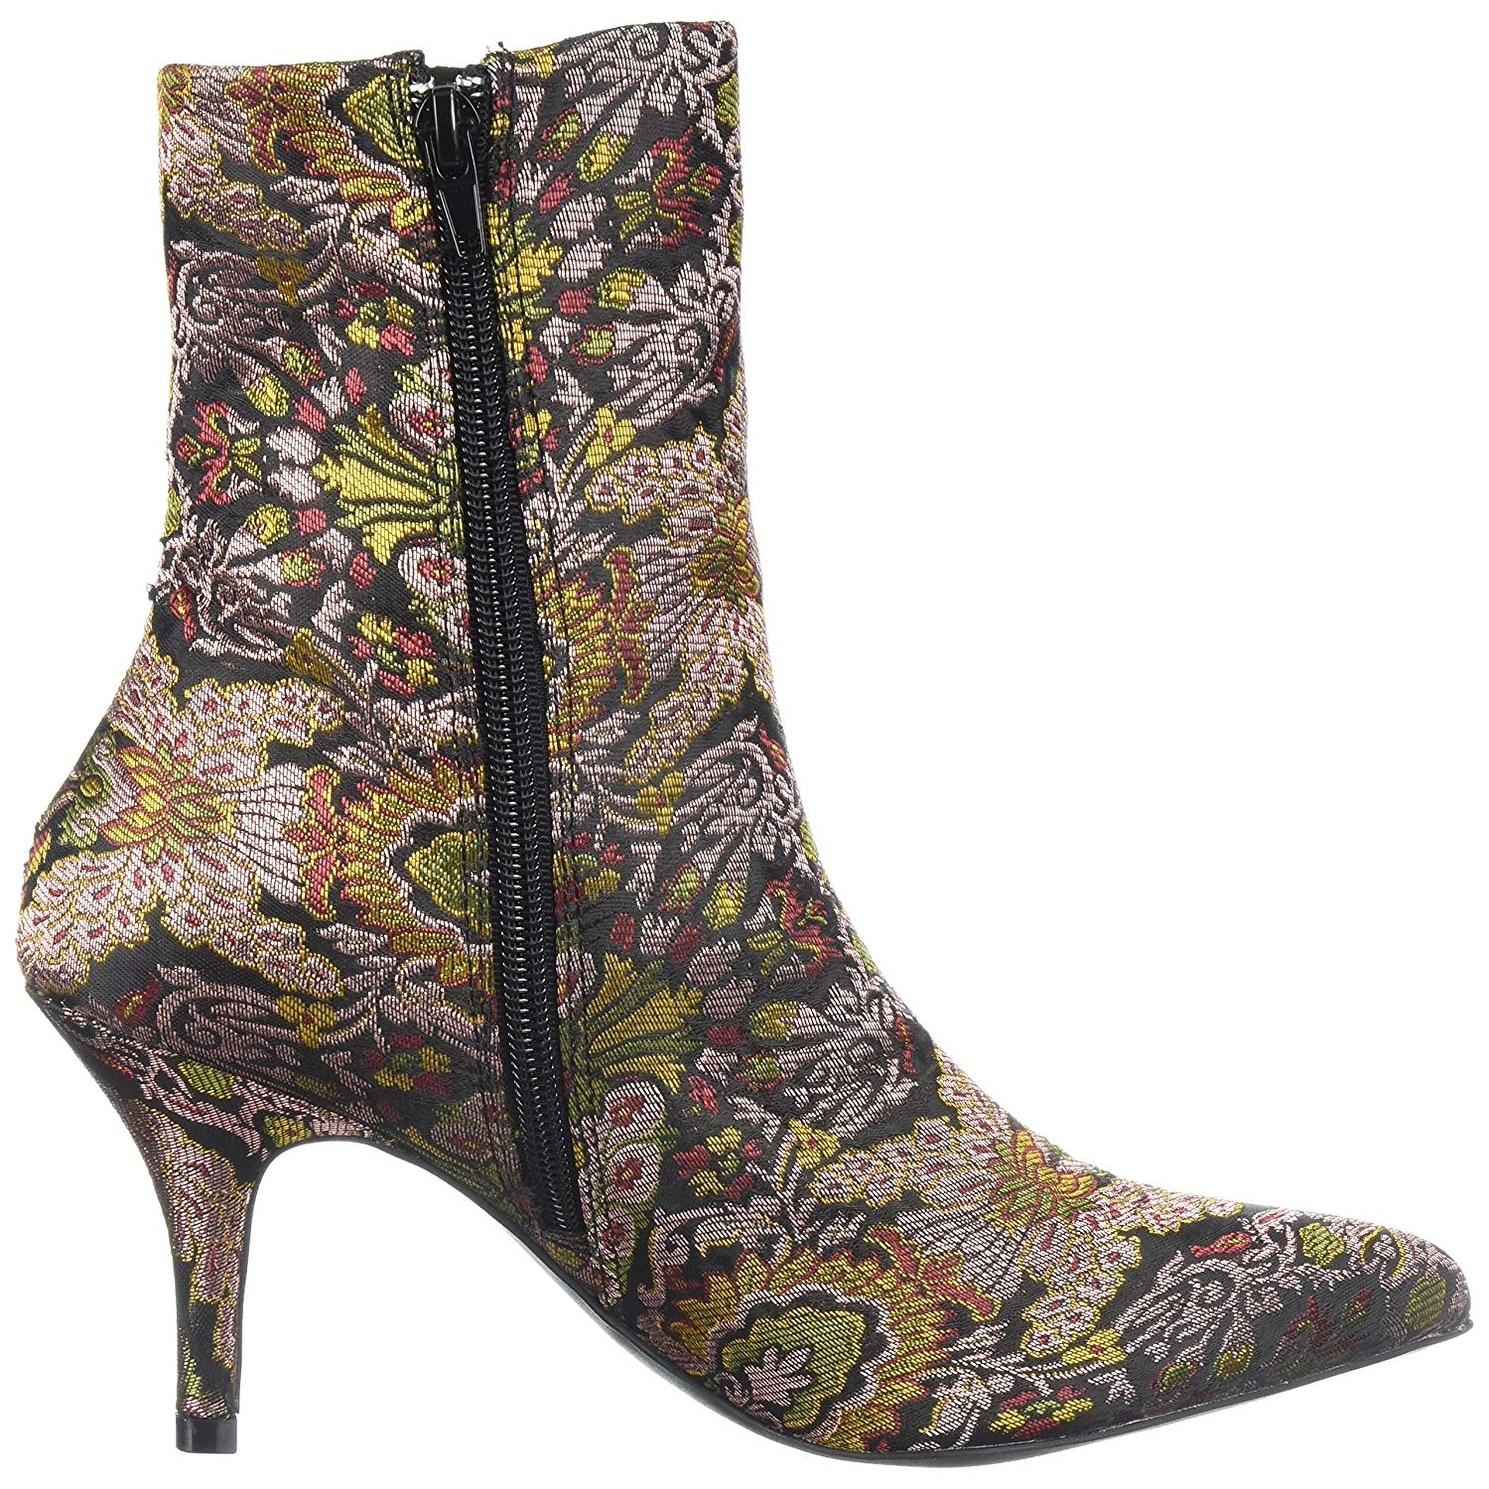 370c42f4f64 Qupid Women's Portia-05 Fashion Boot